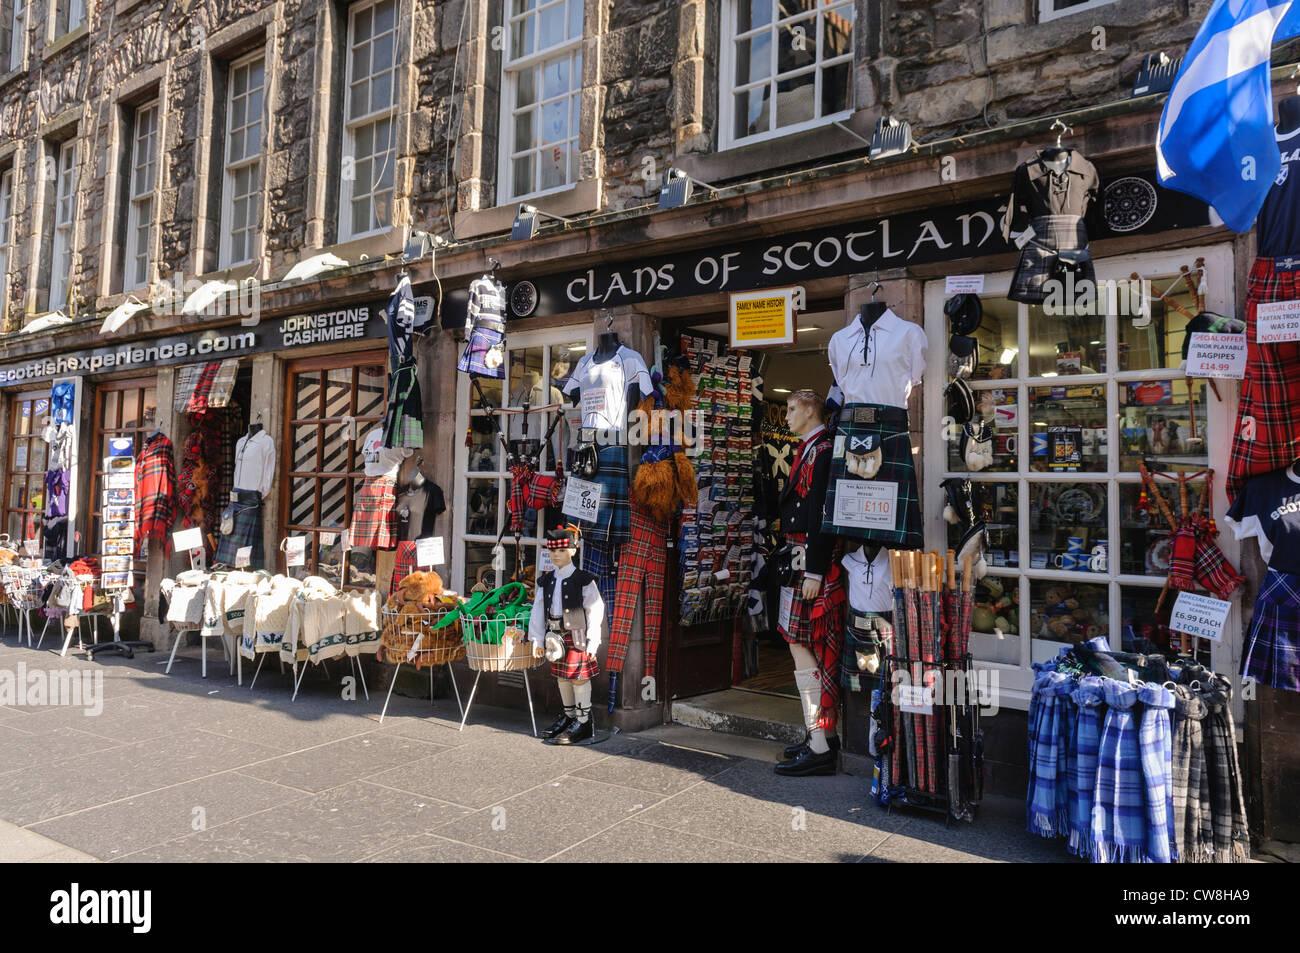 Scottish souvenir shop in Edinburgh, selling tartans, kilts